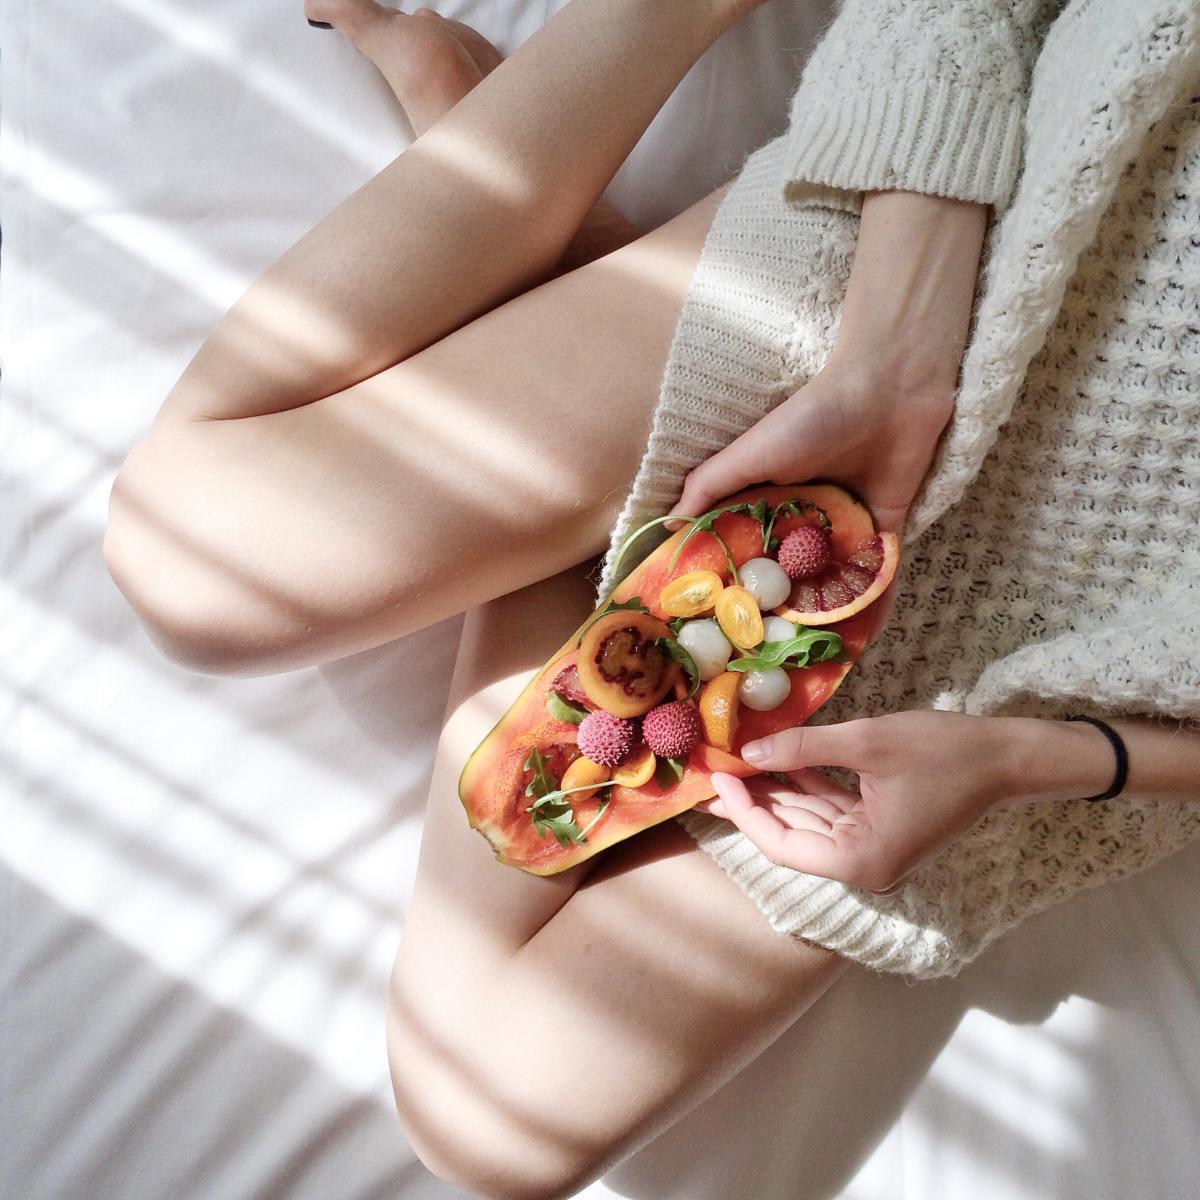 person-holding-papaya-fruit-on-bed-1030870 (1)